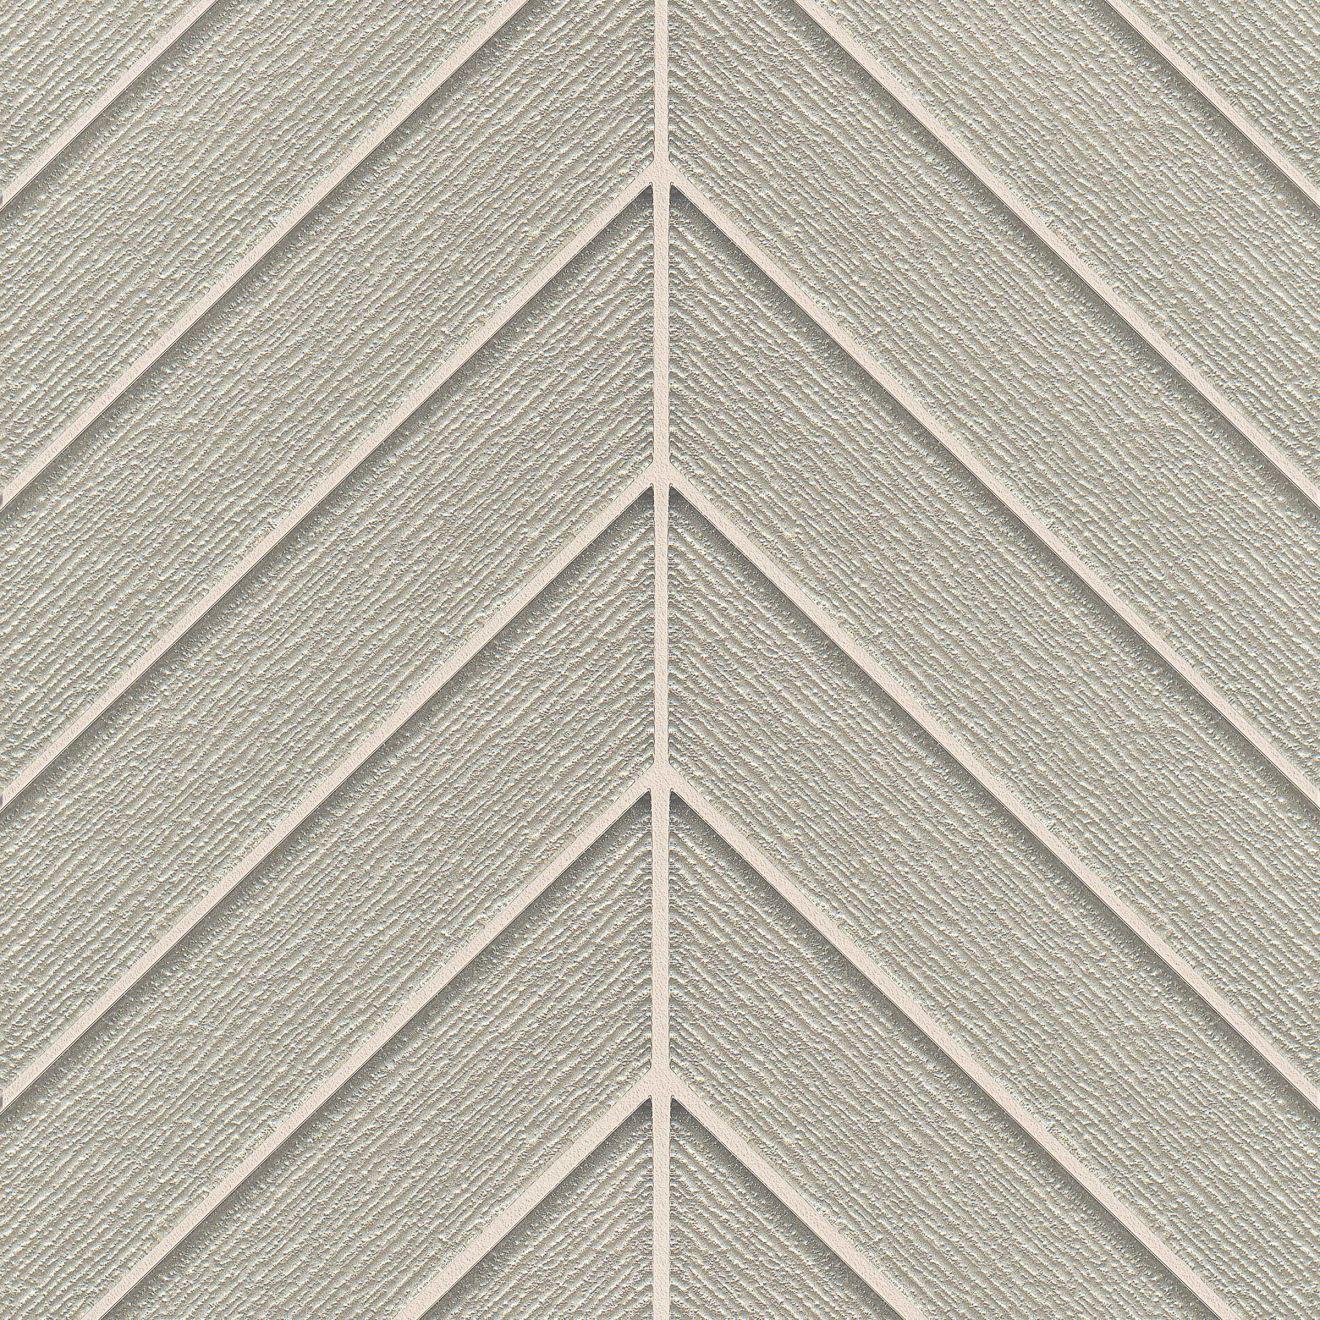 Verve Wall Mosaic in Tinsel Grey